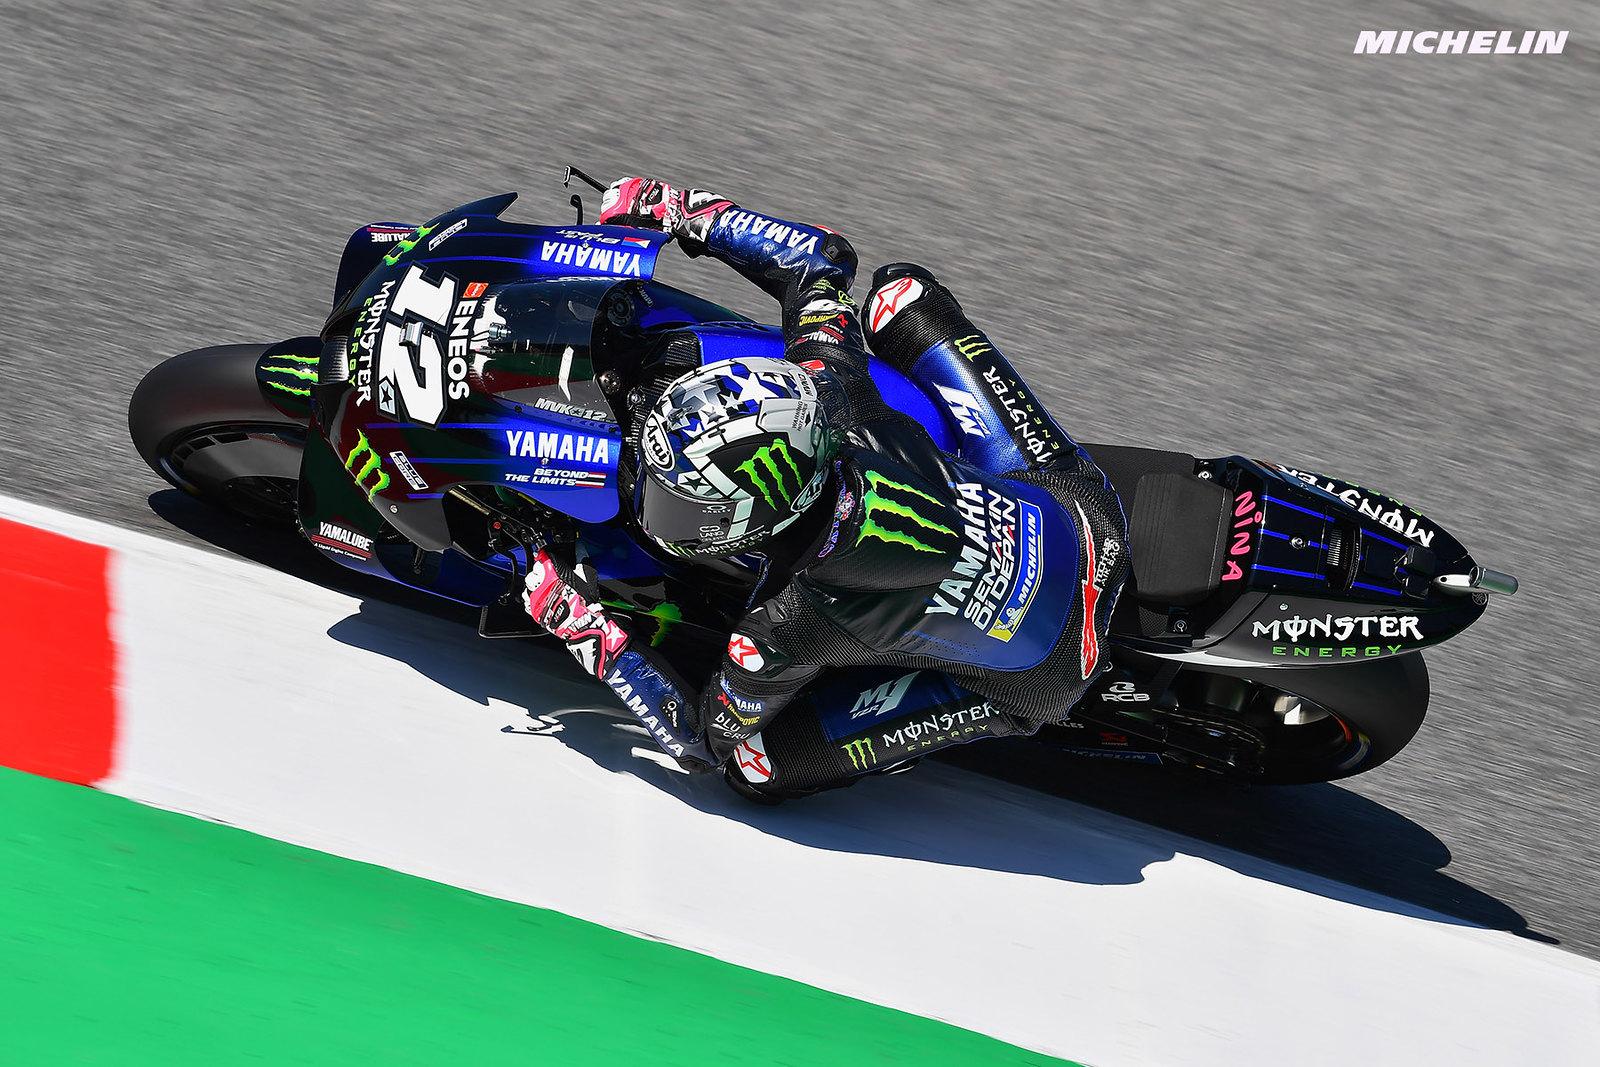 MotoGP2021イタリアGP 総合8位マーべリック・ビニャーレス「明日に向けて大きく改善出来る」